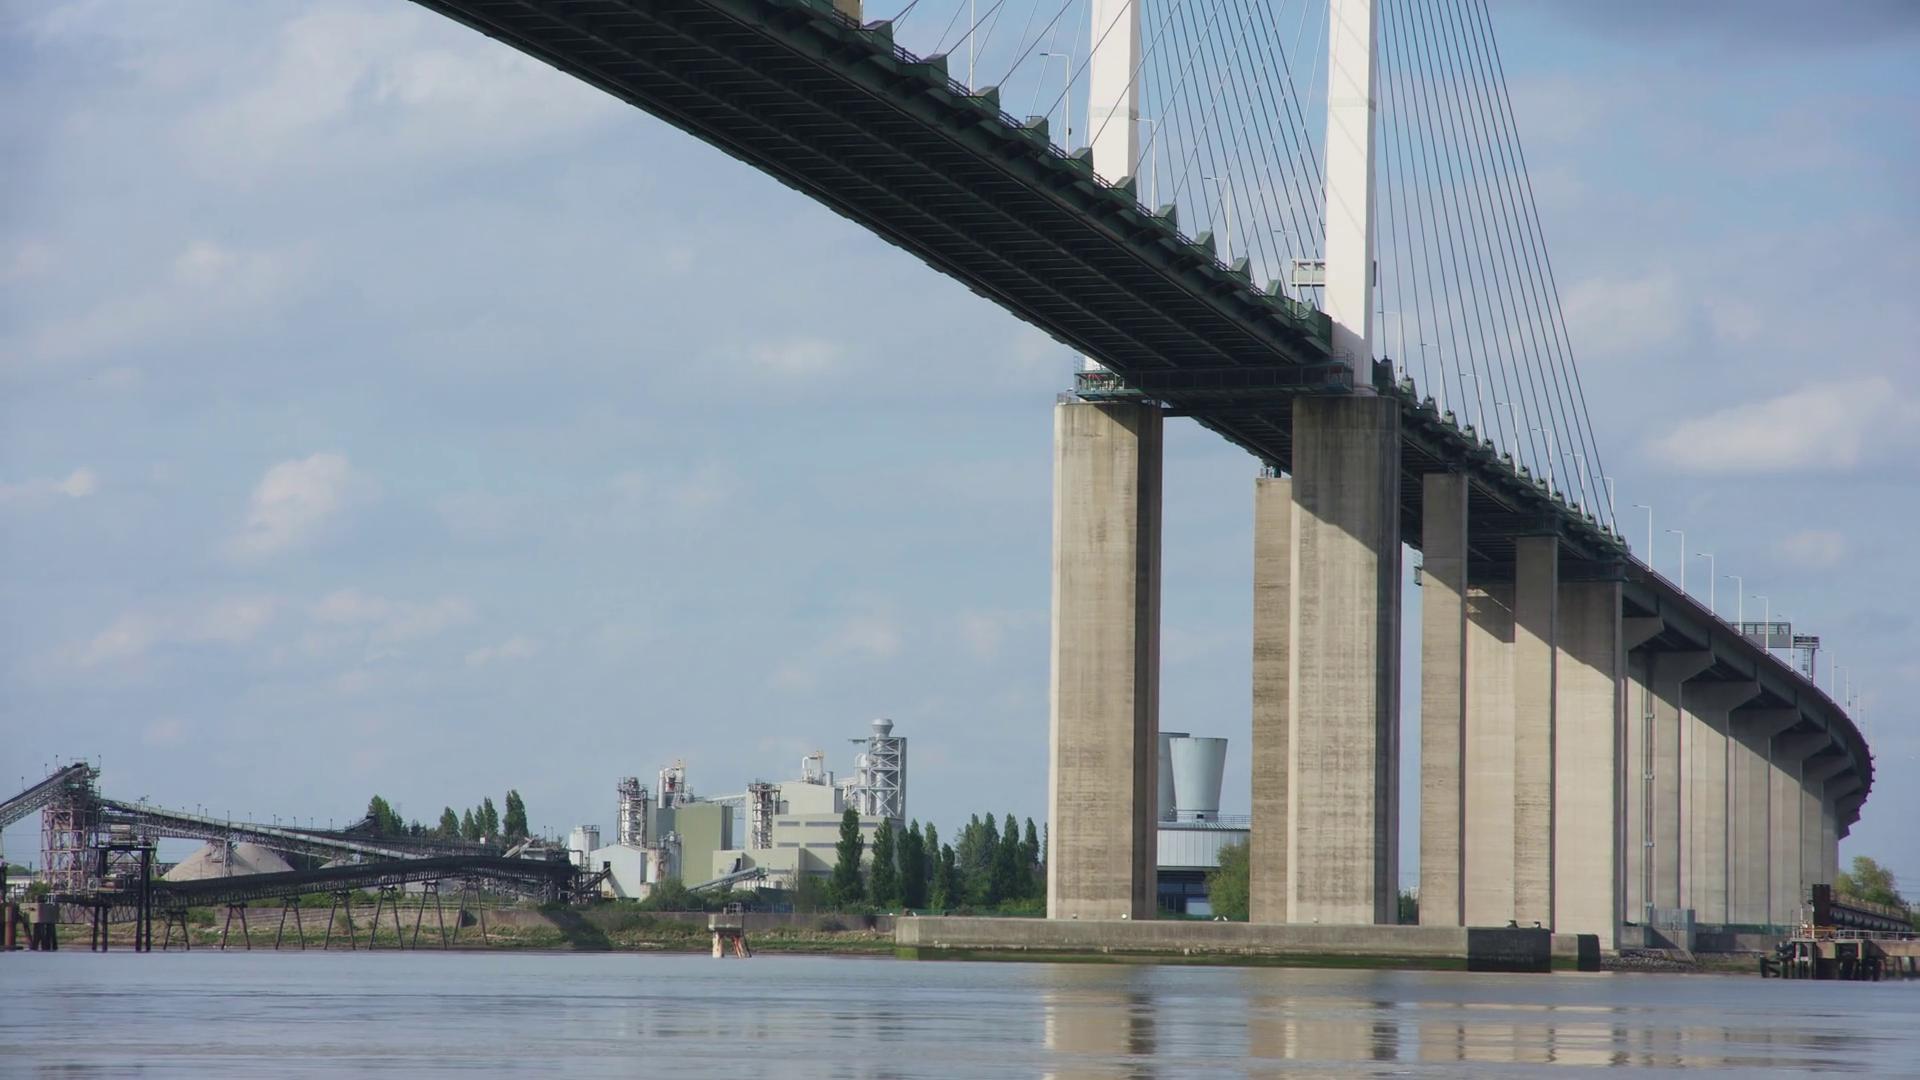 Bridge pillars photo